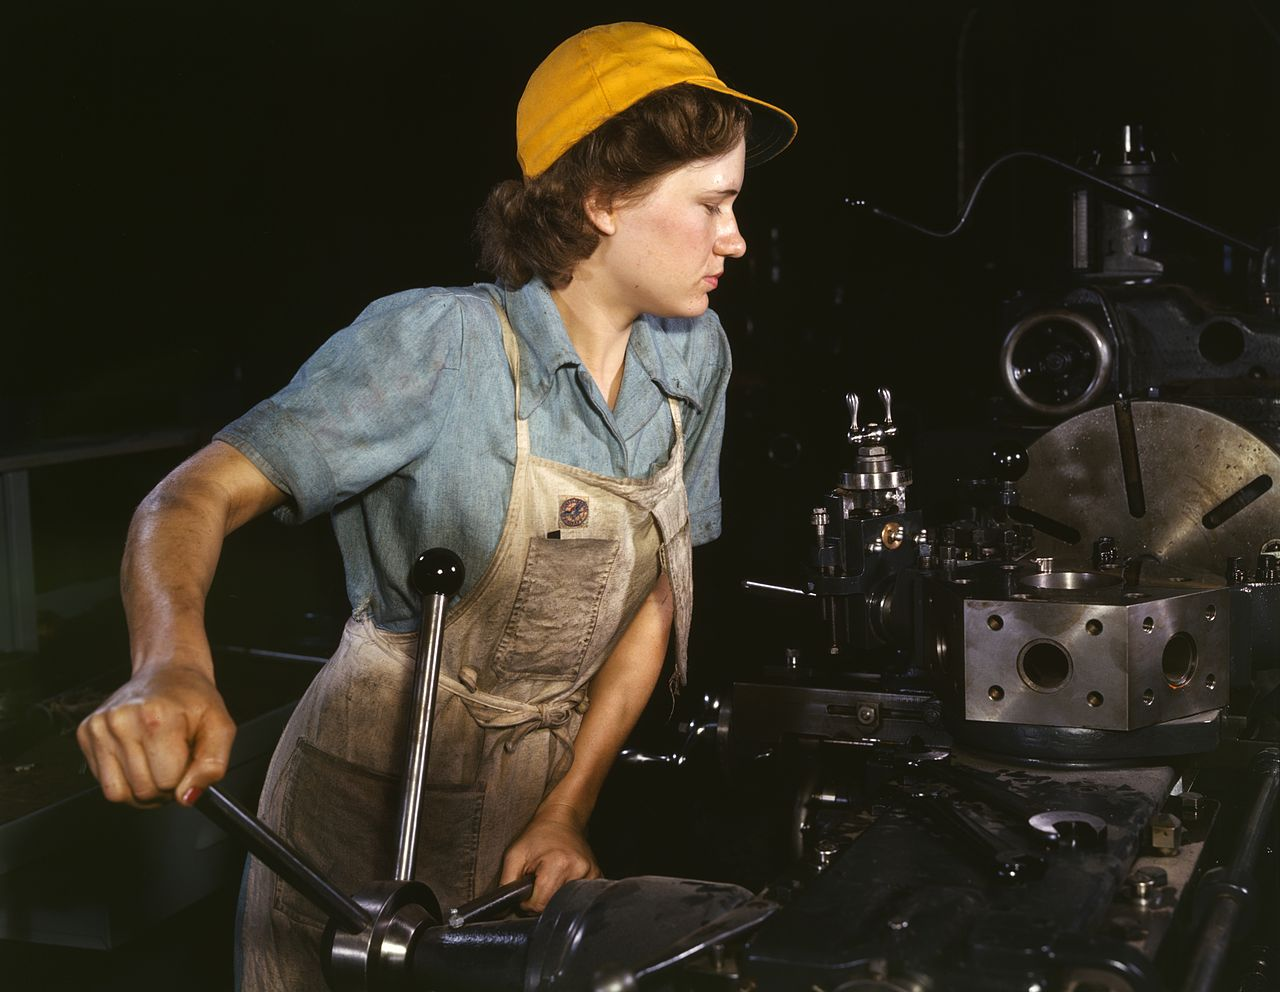 madre trabajadora fabrica